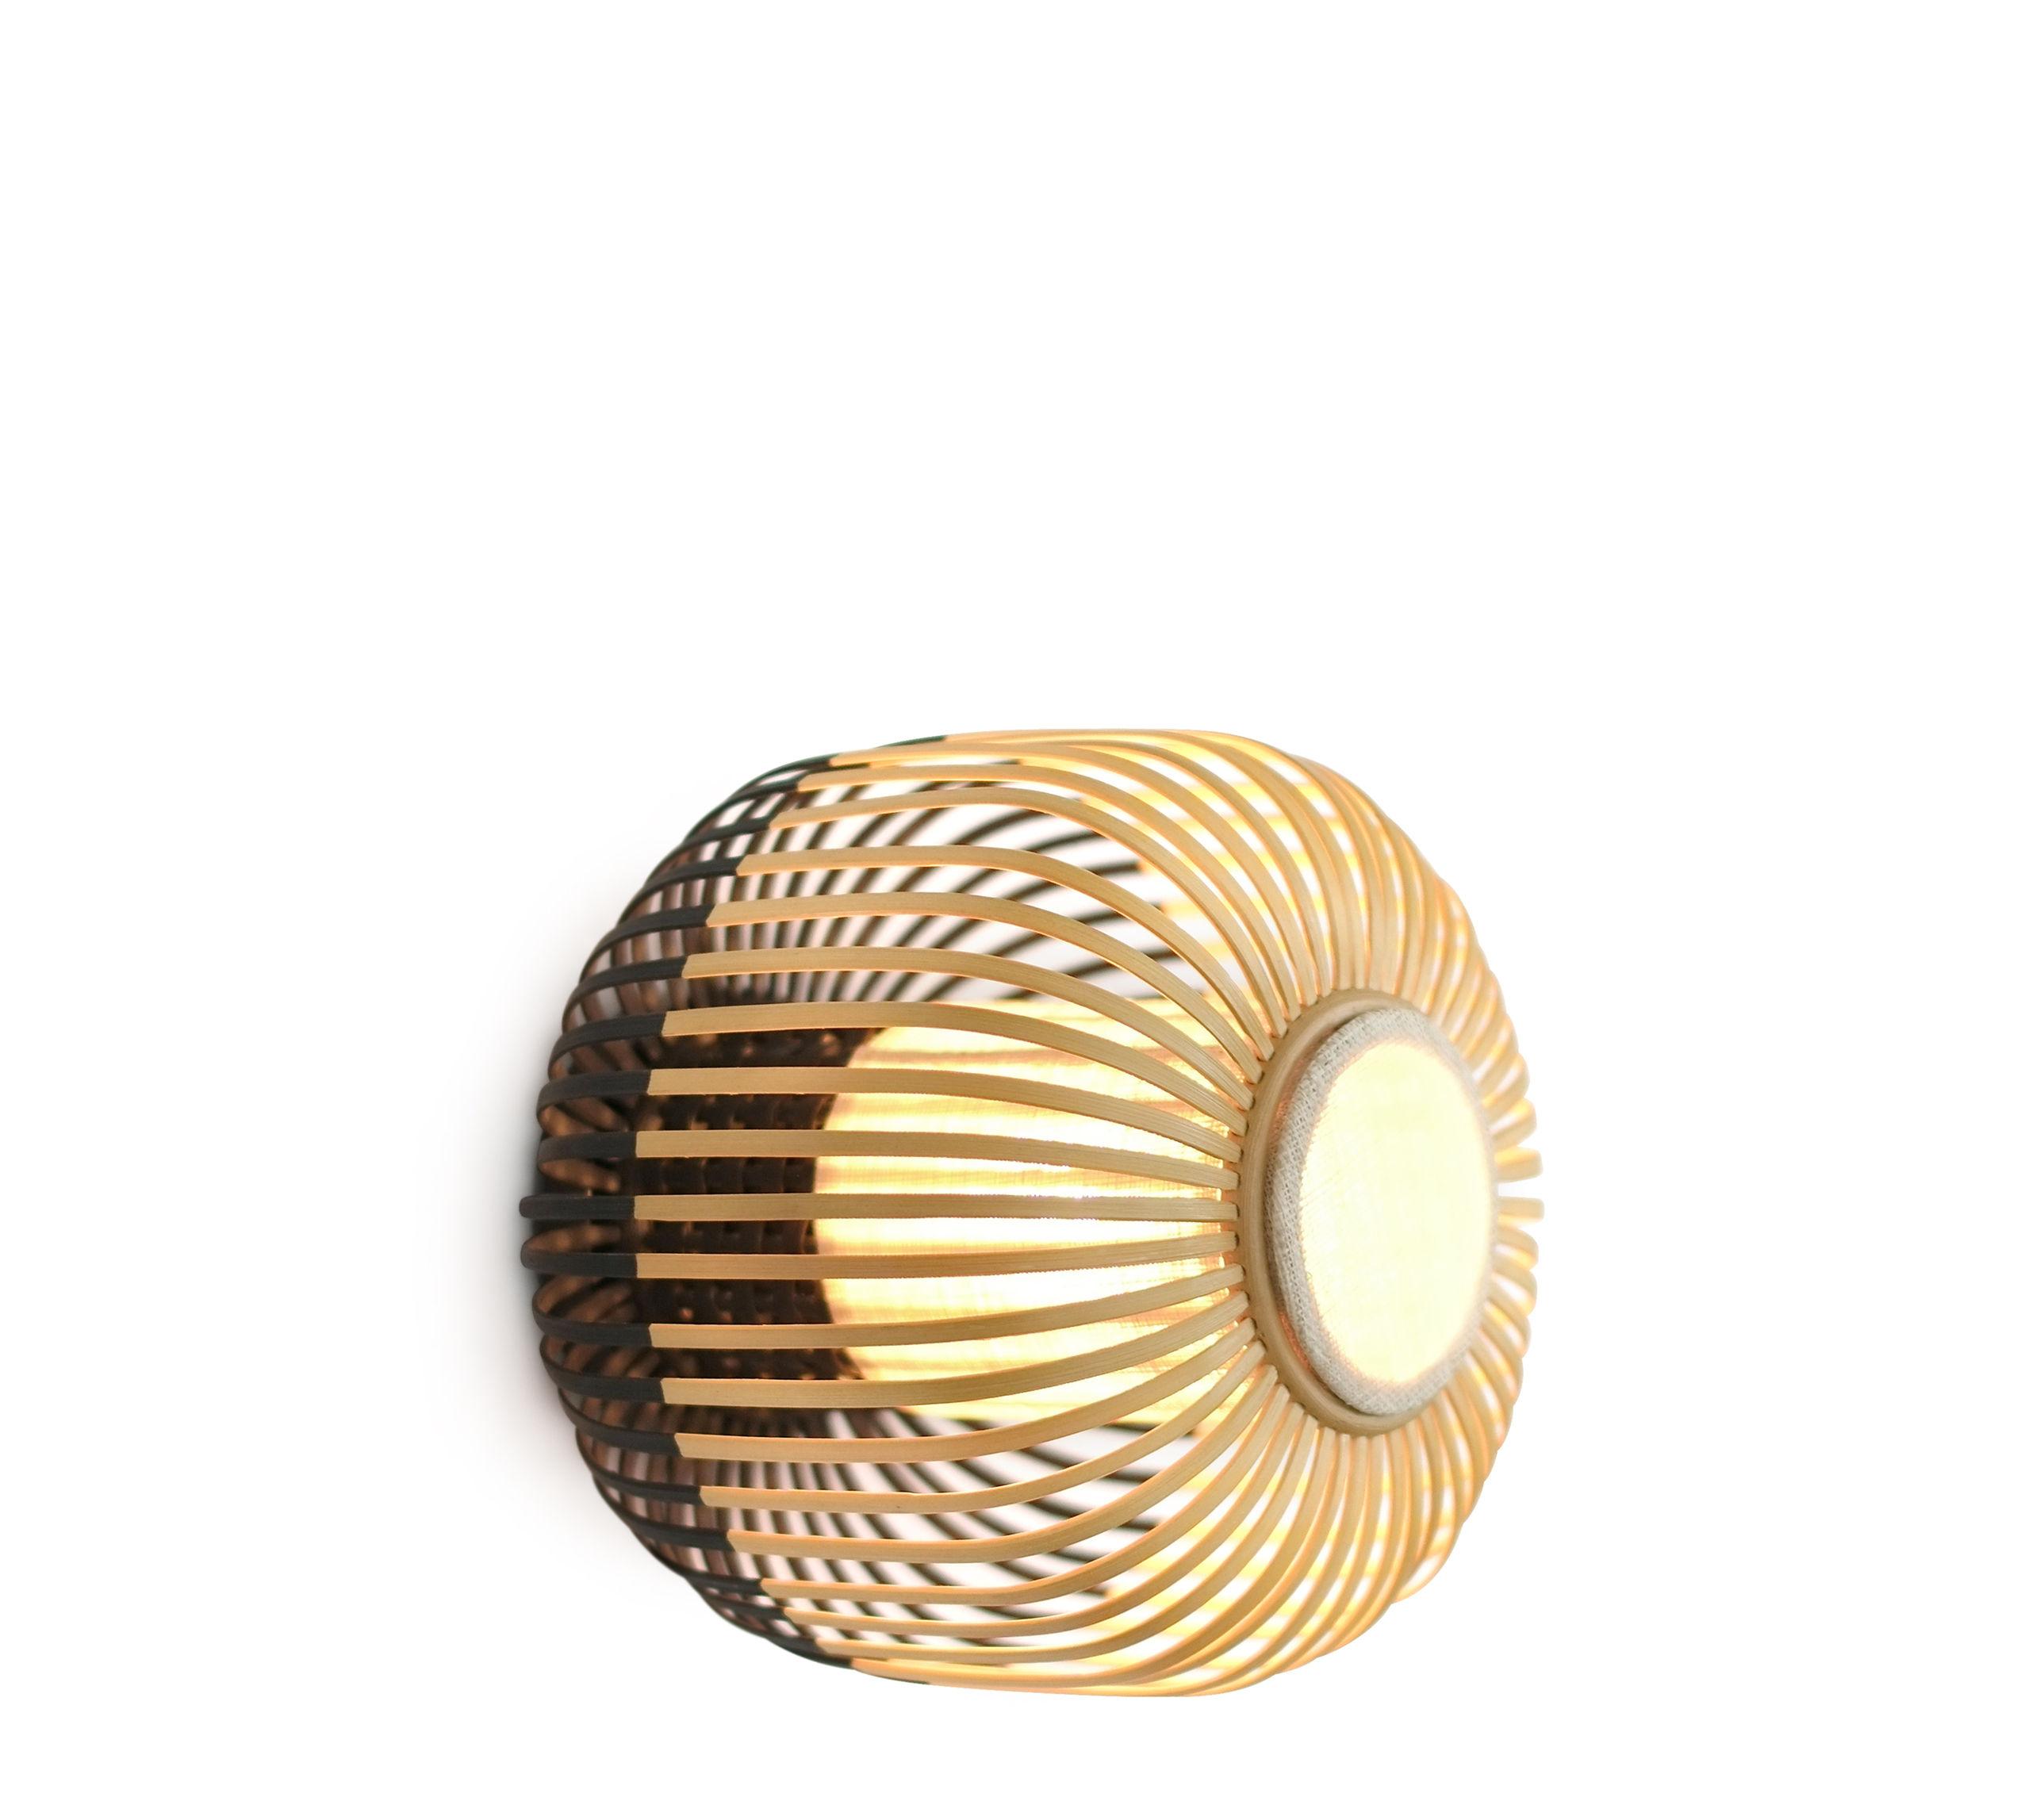 Illuminazione - Lampade da parete - Applique Bamboo light XS / Plafoniera - Ø 27 x H 20 cm - Forestier - Noir / Naturel - Bambù naturale, Tessuto